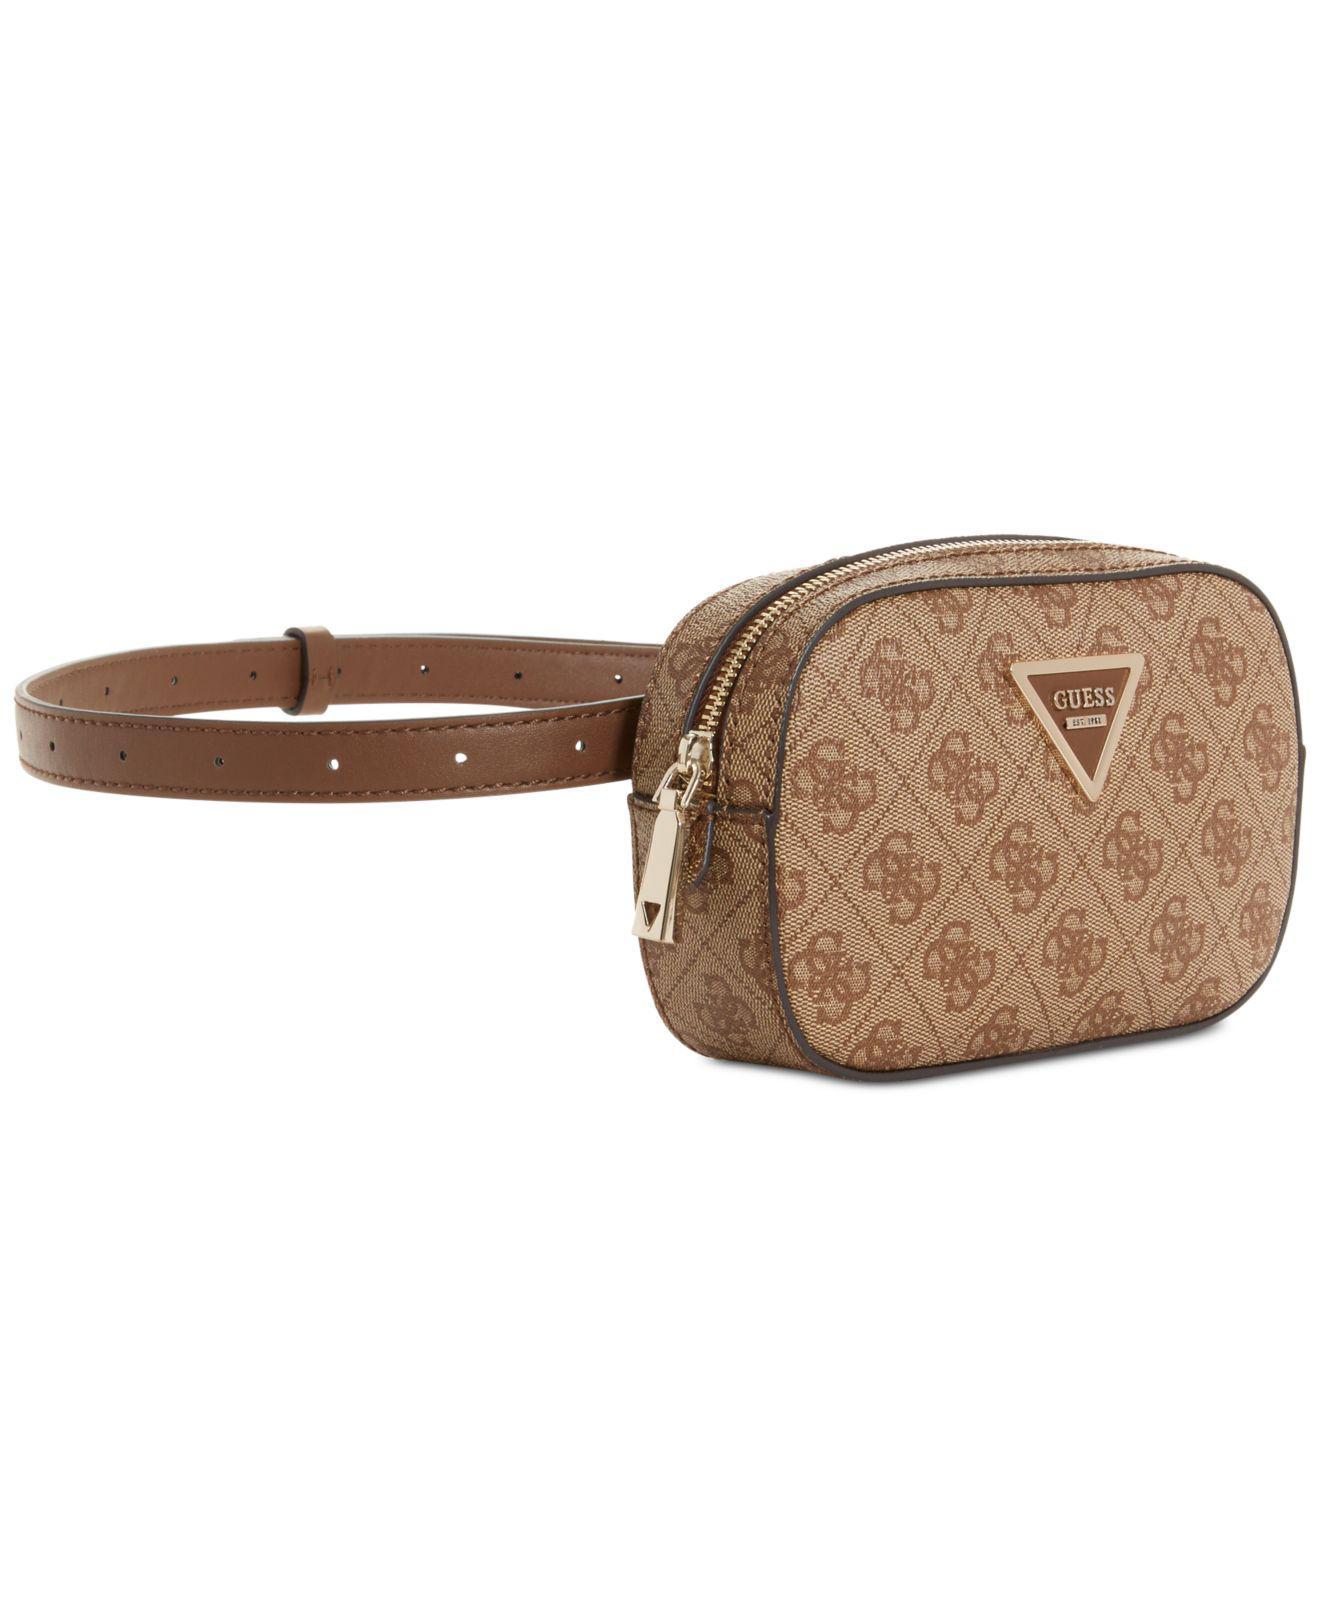 Lyst - Guess Varsity Pop Signature Belt Bag in Brown 47fe56d5c6050